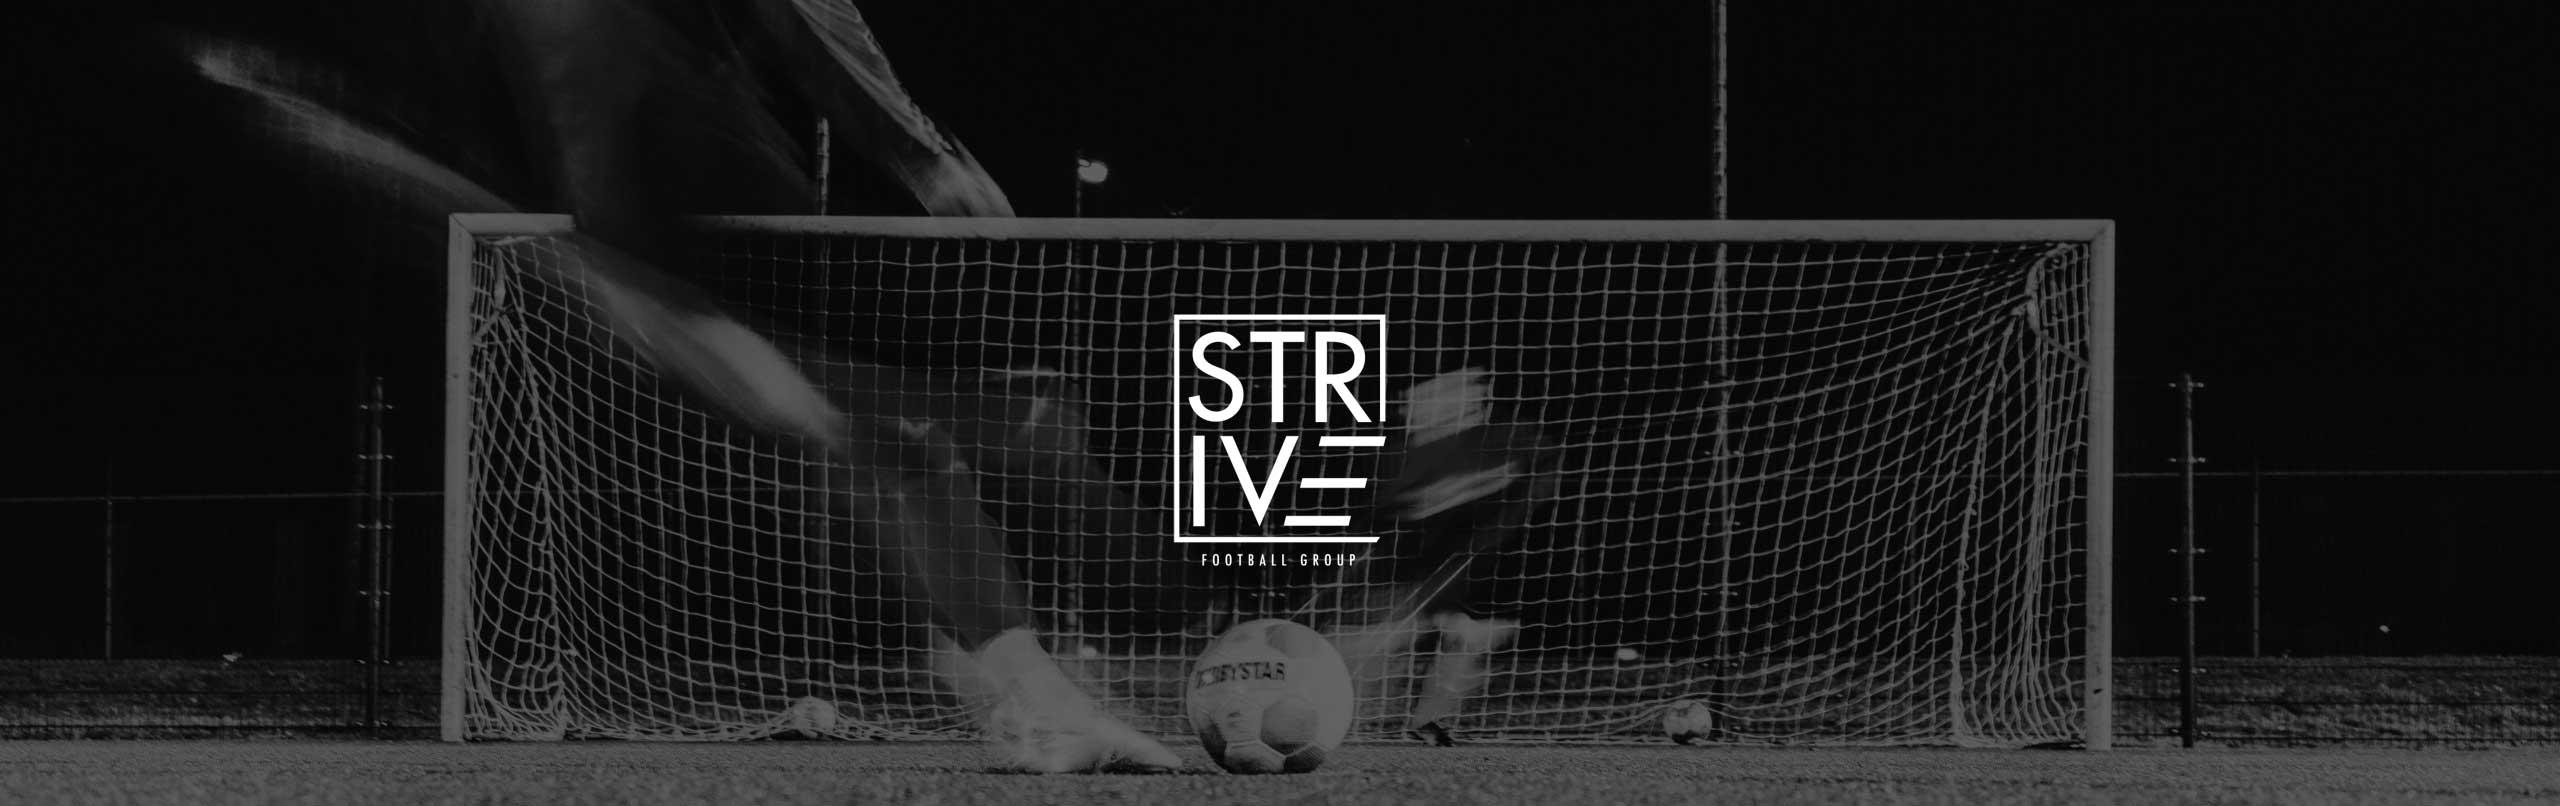 Strive Football Group Soccer Teams, Academies, Player Development, Sports Marketing, Venture Capital